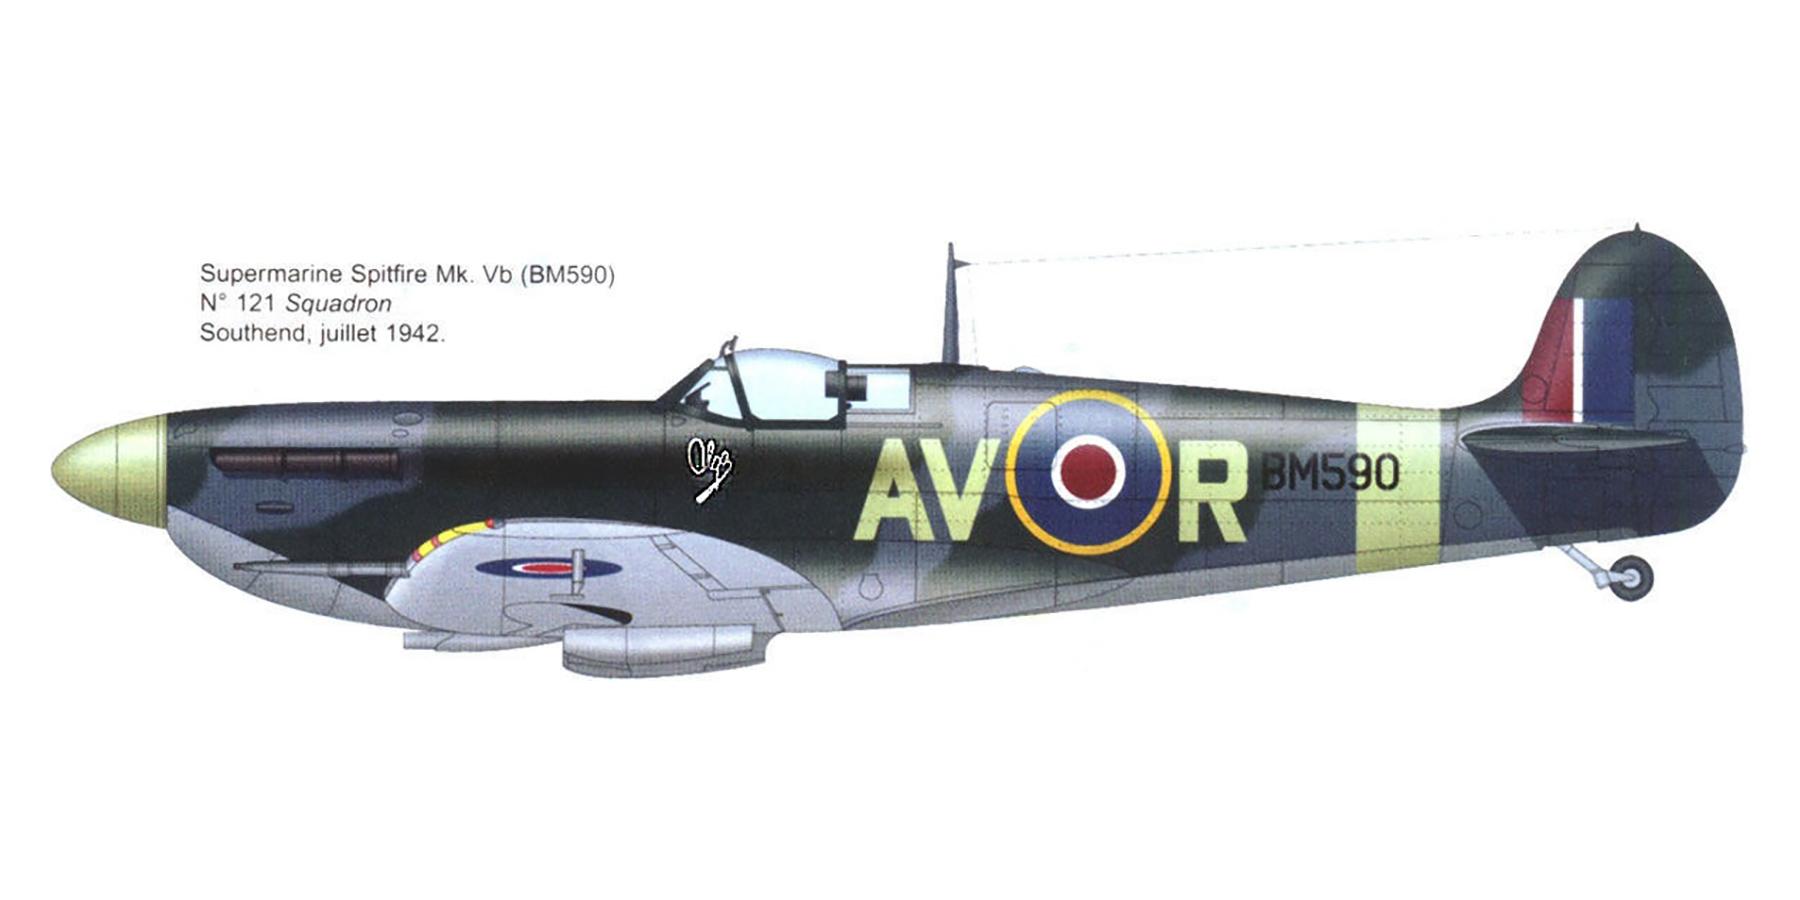 Spitfire MkVb RAF 121Sqn AVR Olga BM590 Debden Essex 1941 0A